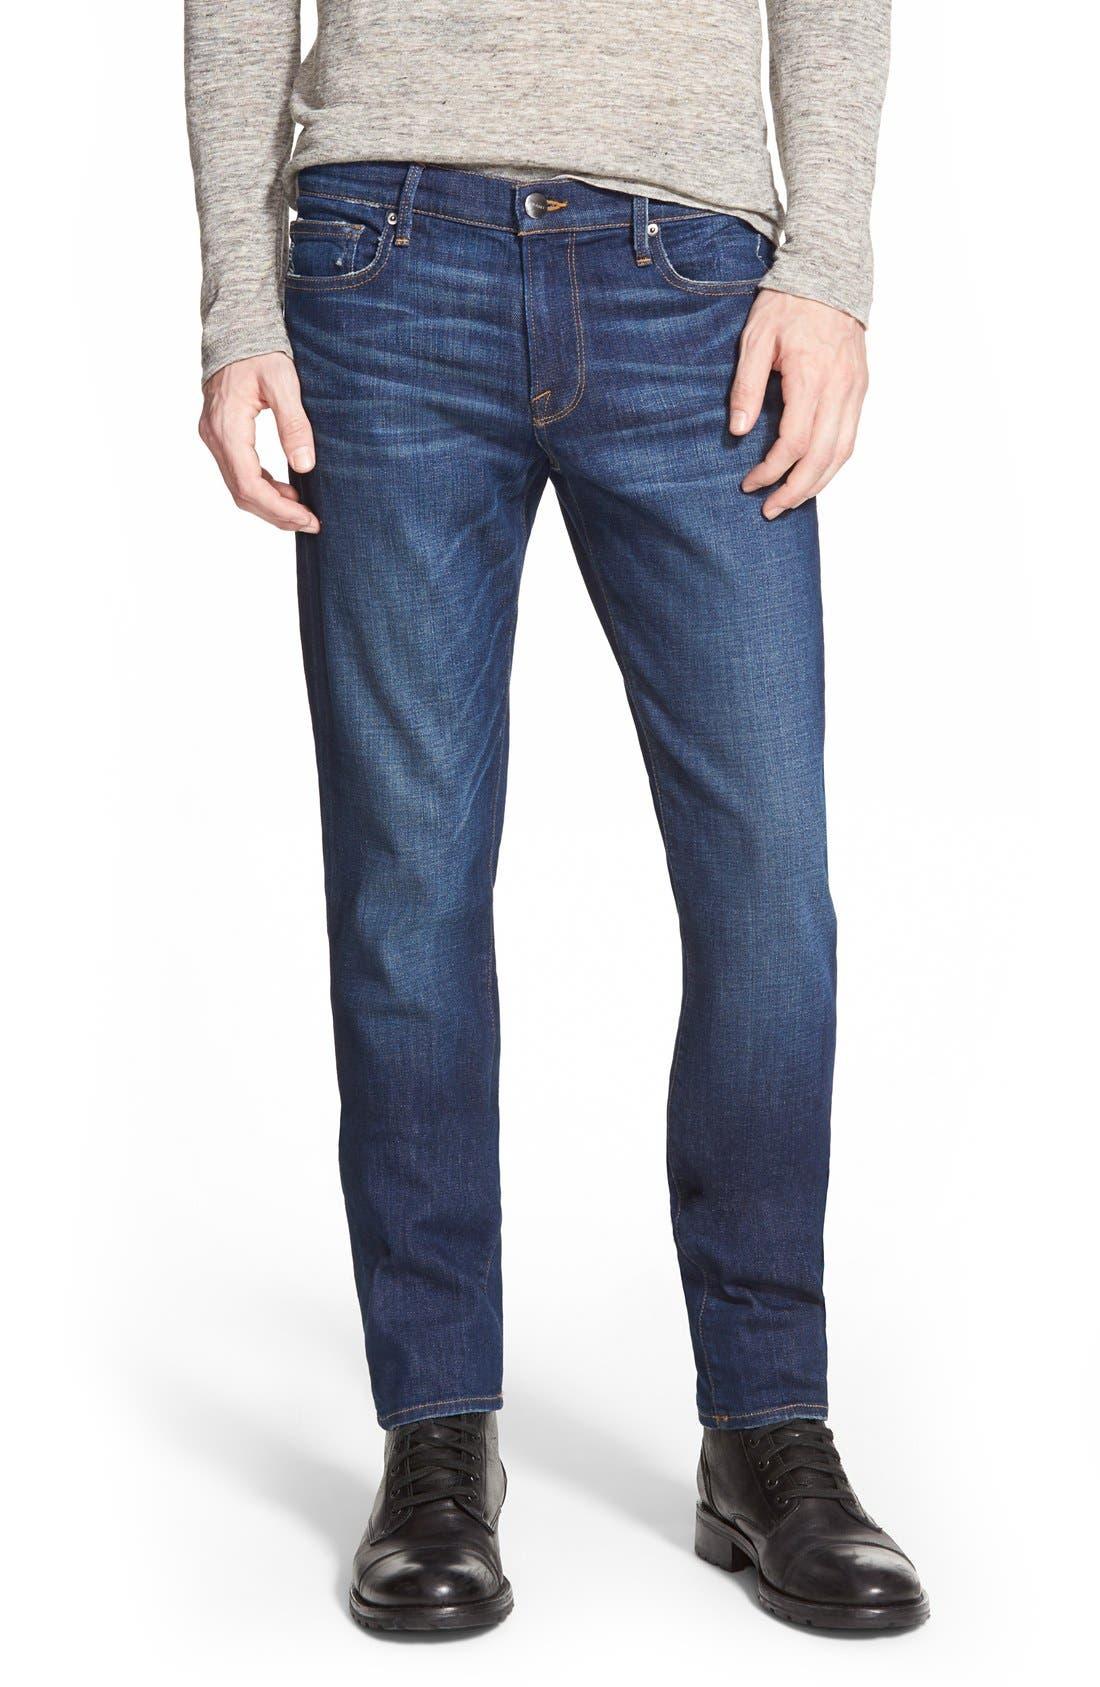 L'Homme Slim Fit Jeans,                         Main,                         color, Niagra